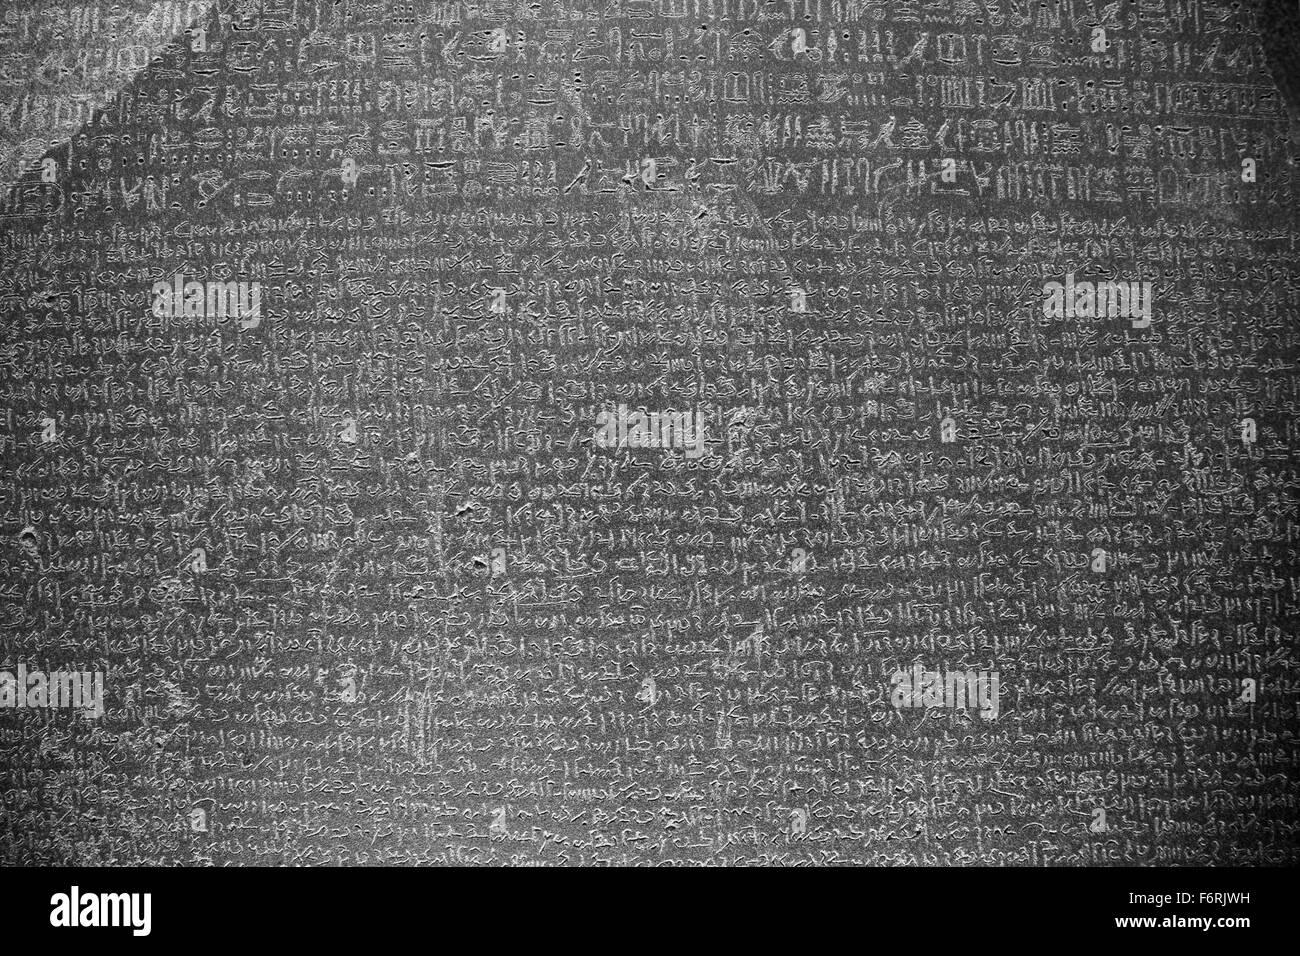 Rosetta Stone, 196 BC, British Museum, London, England UK - Stock Image